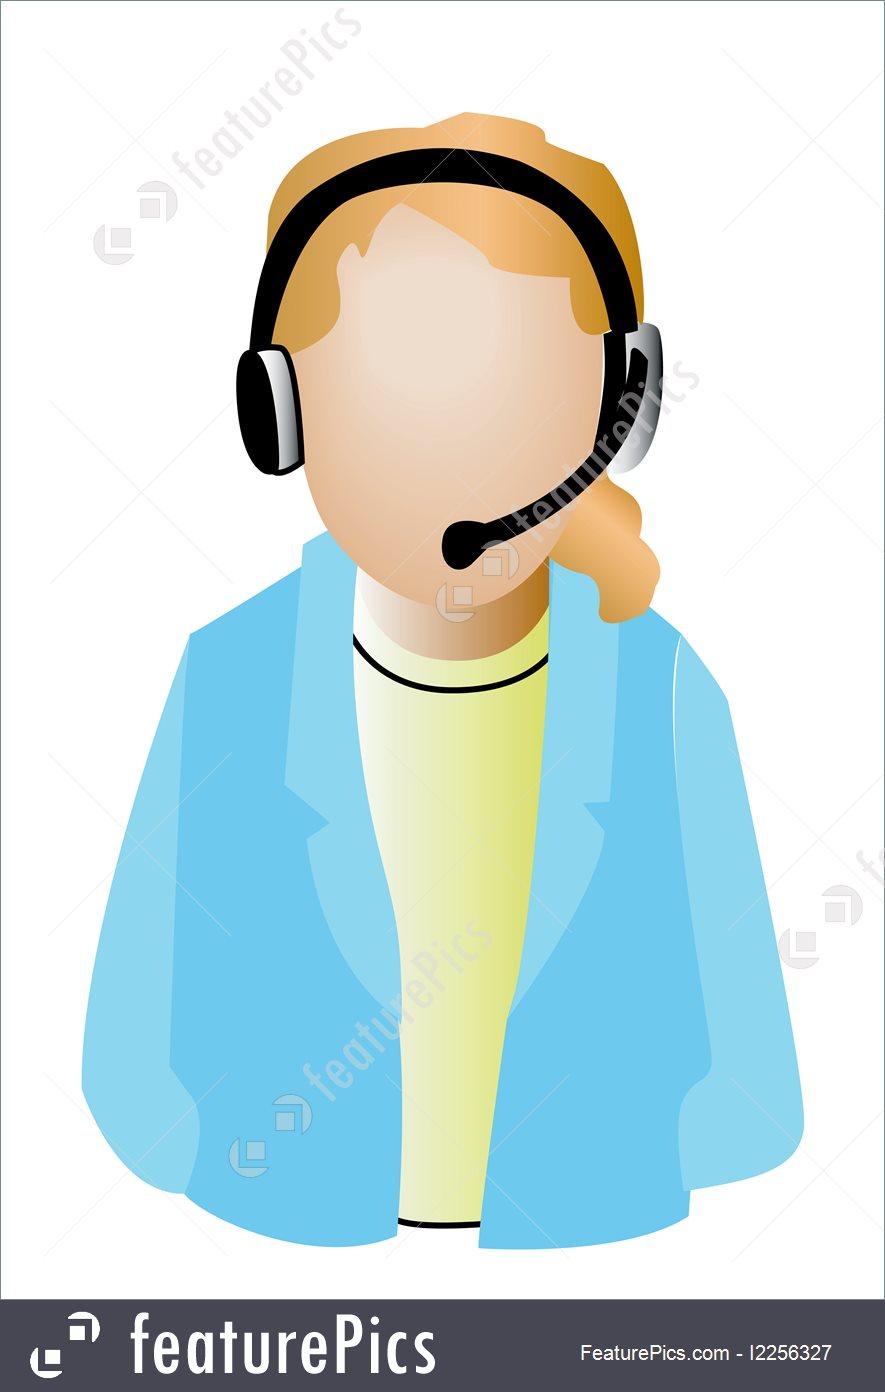 885x1392 Customer Service Representatives Call Center Agent